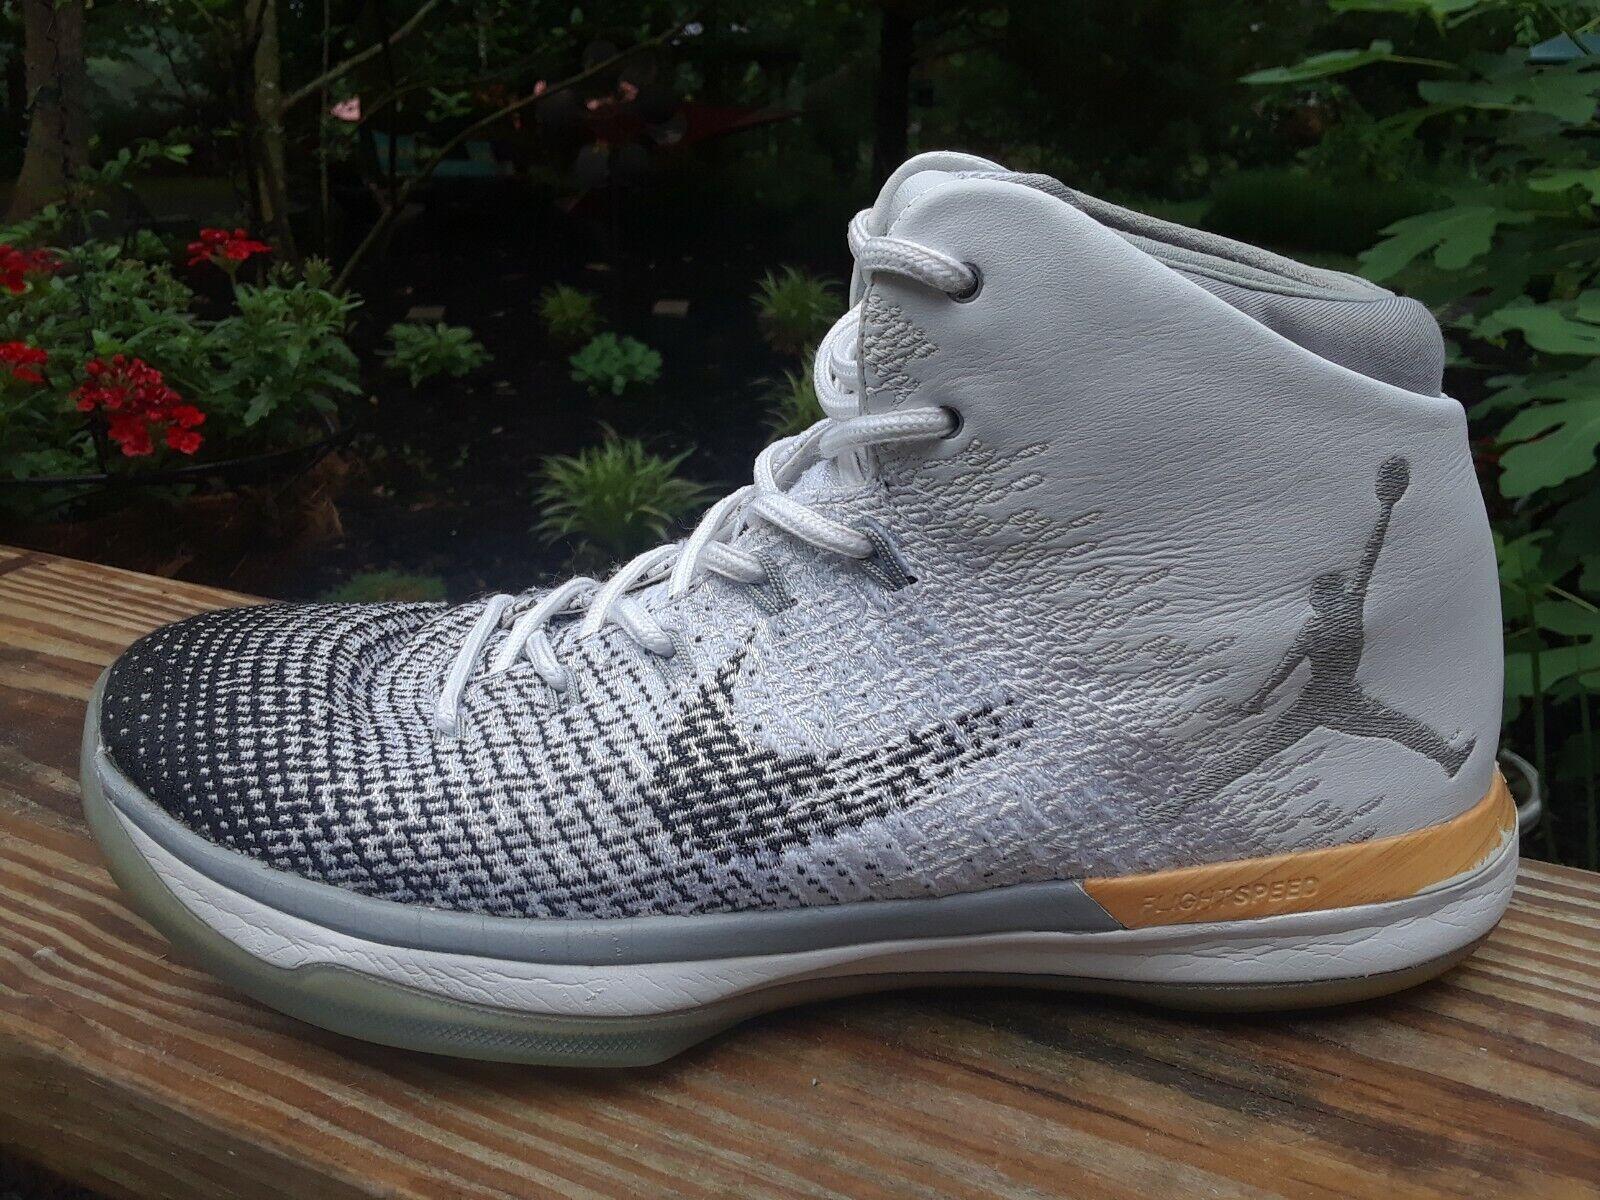 Nike AIR JORDAN XXXI 31 CHINESE NEW YEAR 885429 103 Multi sizes